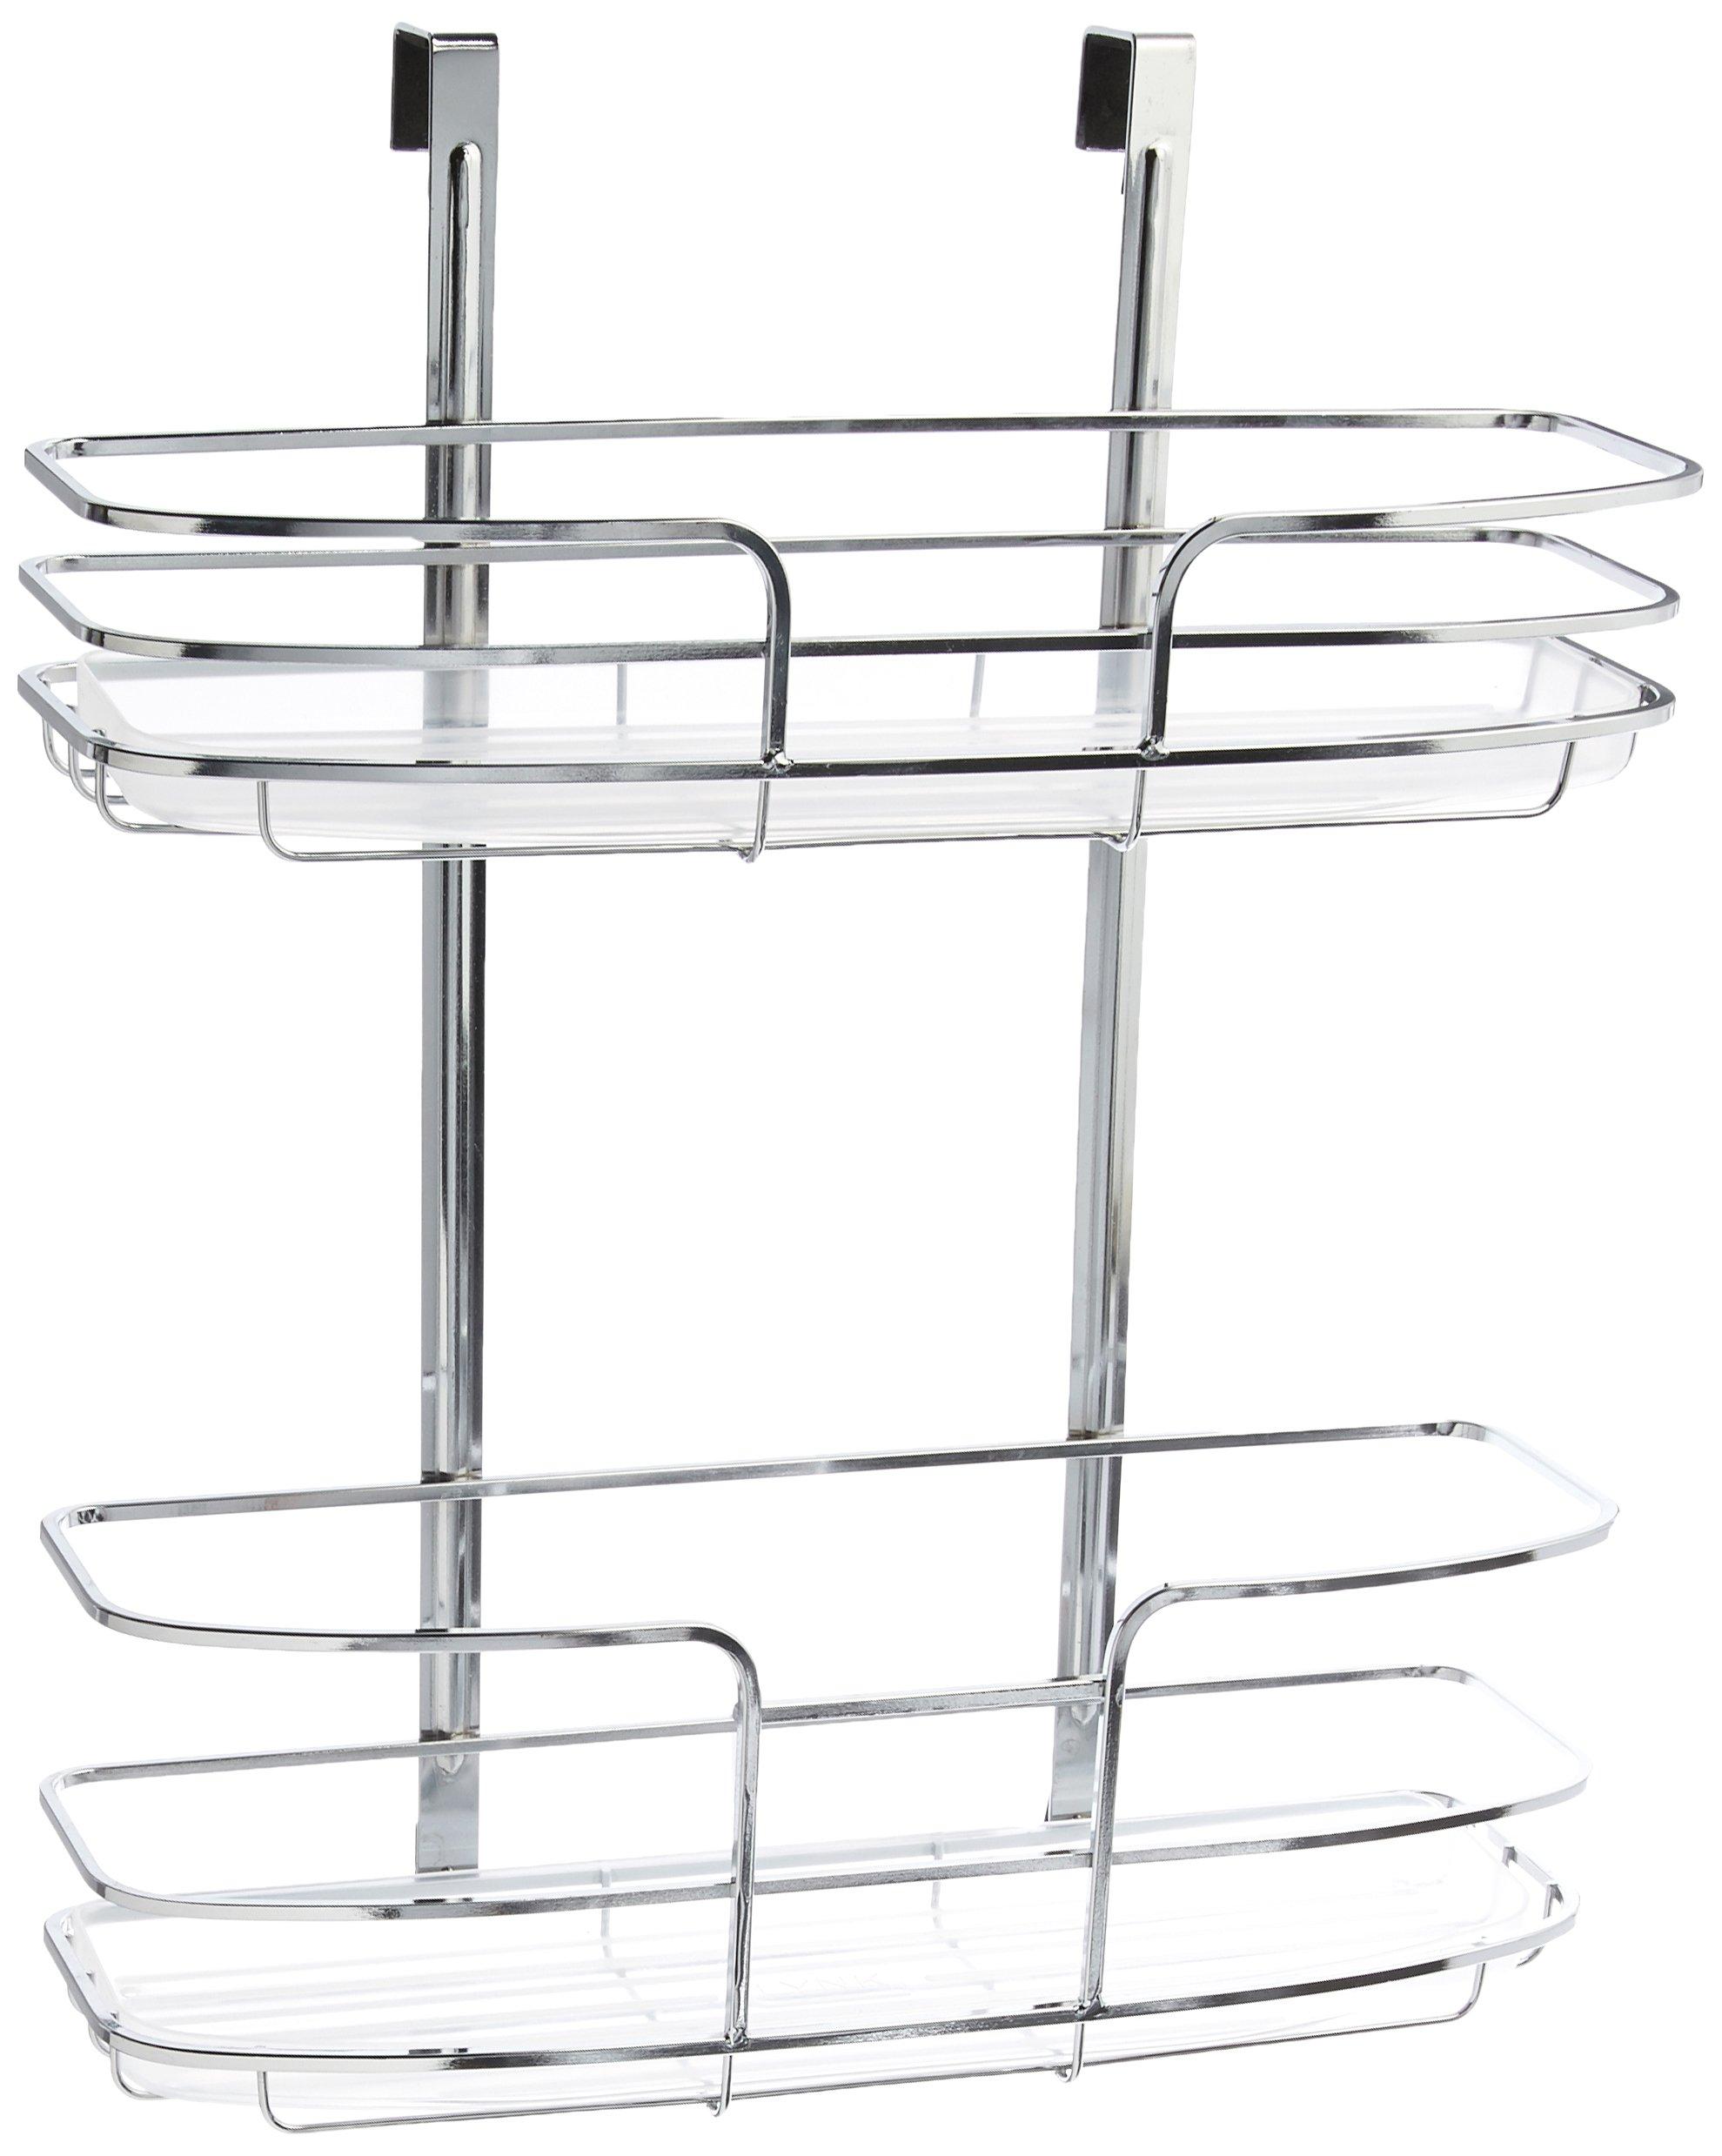 Lynk Over Cabinet Door Organizer - Double Shelf - w/Molded Tray - Chrome